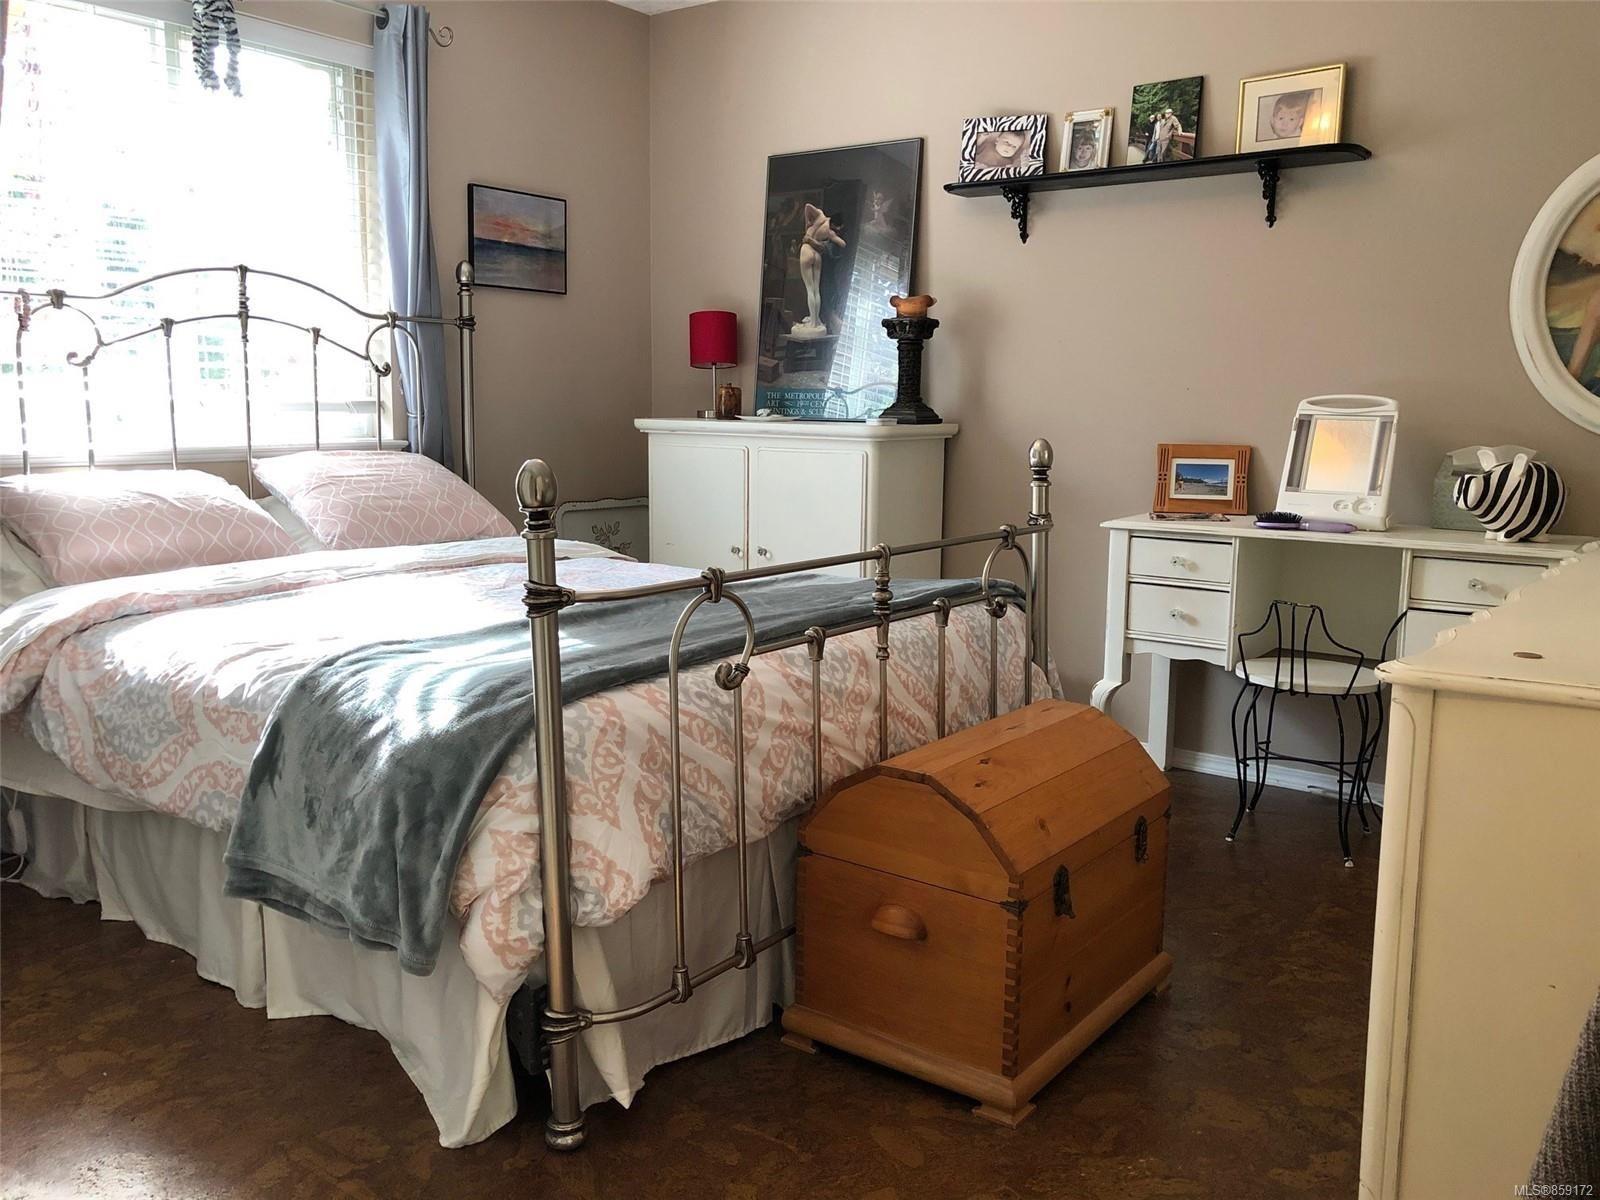 Photo 6: Photos: 1723 Karen's Crt in : PQ Qualicum North House for sale (Parksville/Qualicum)  : MLS®# 859172